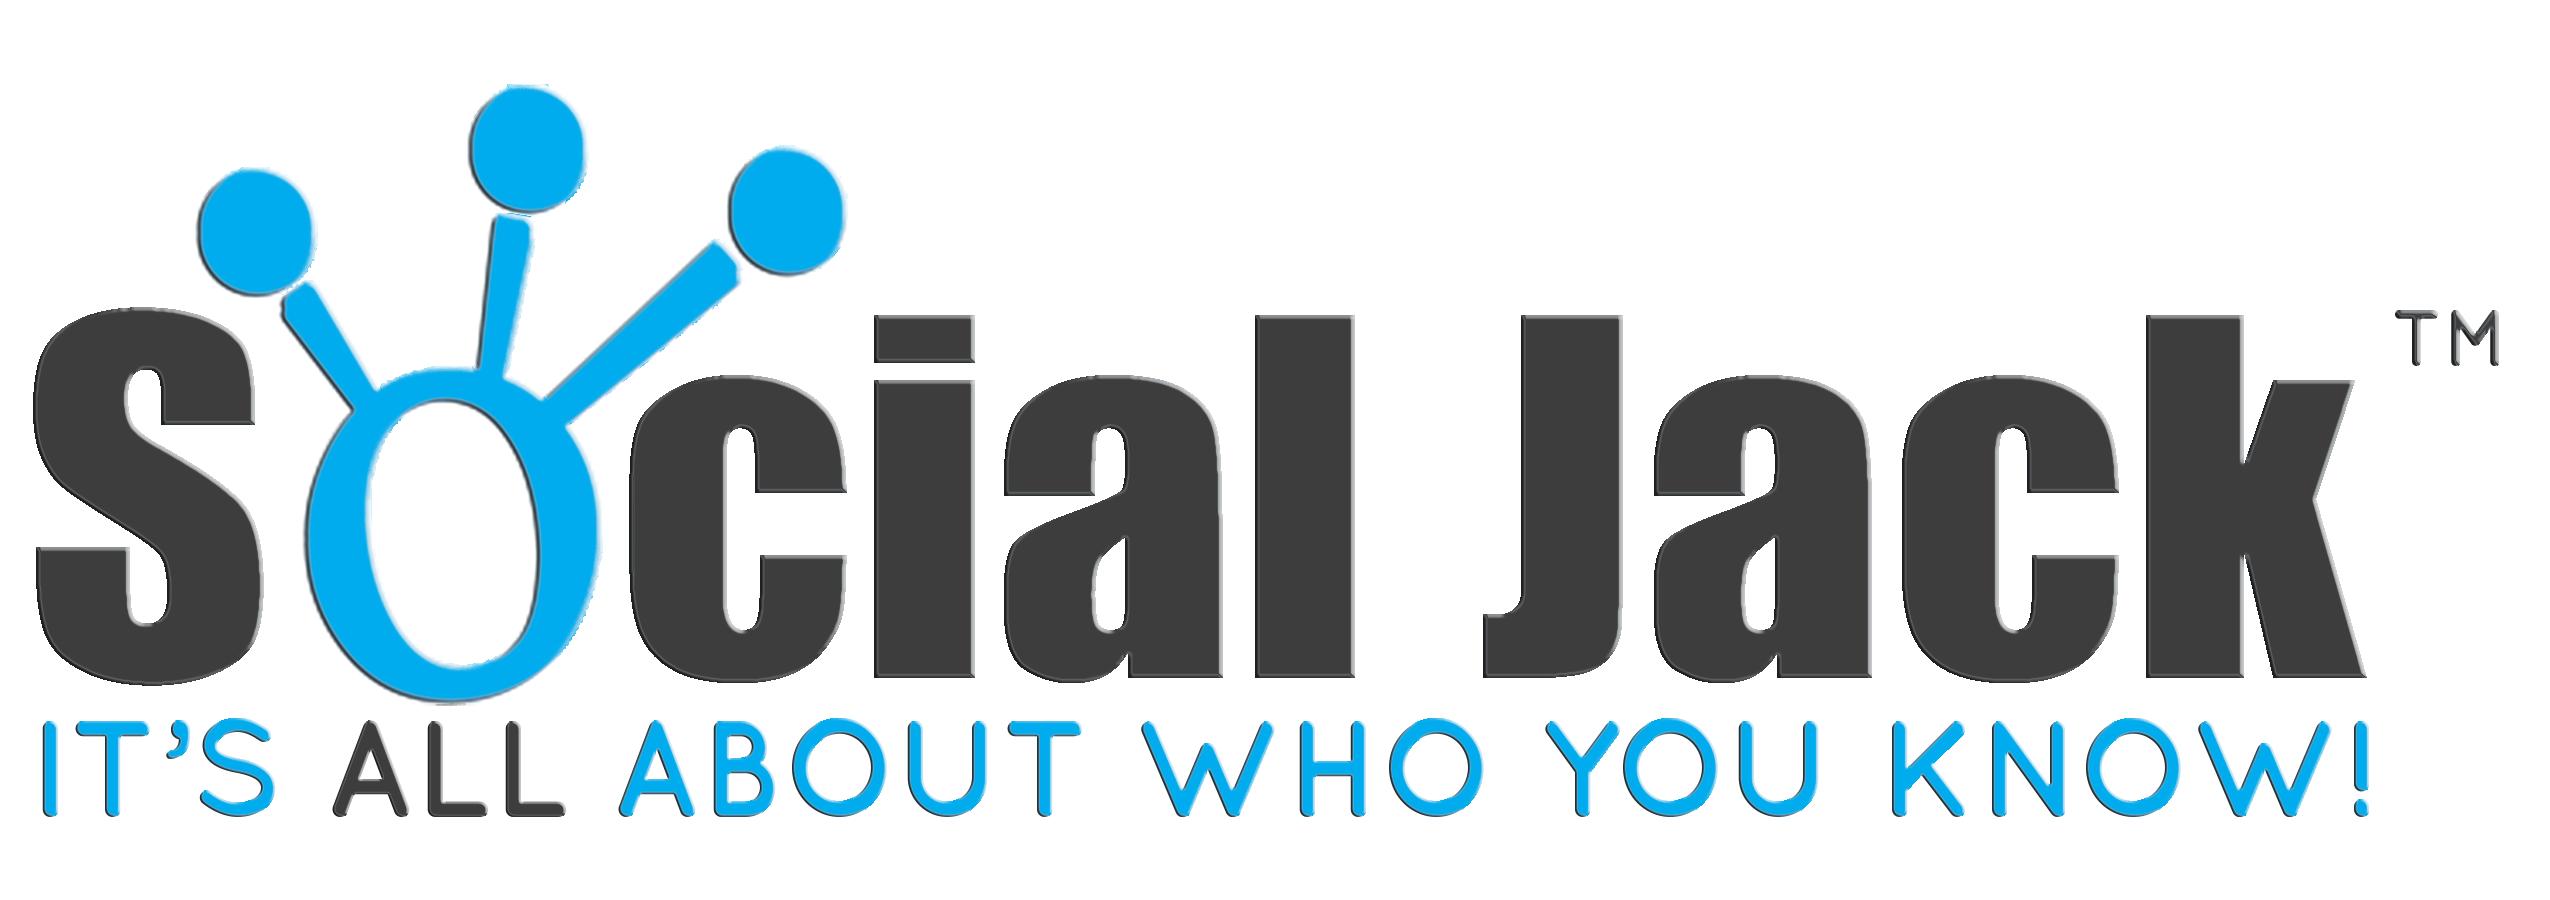 SJ_logo_gray_tagline white BG